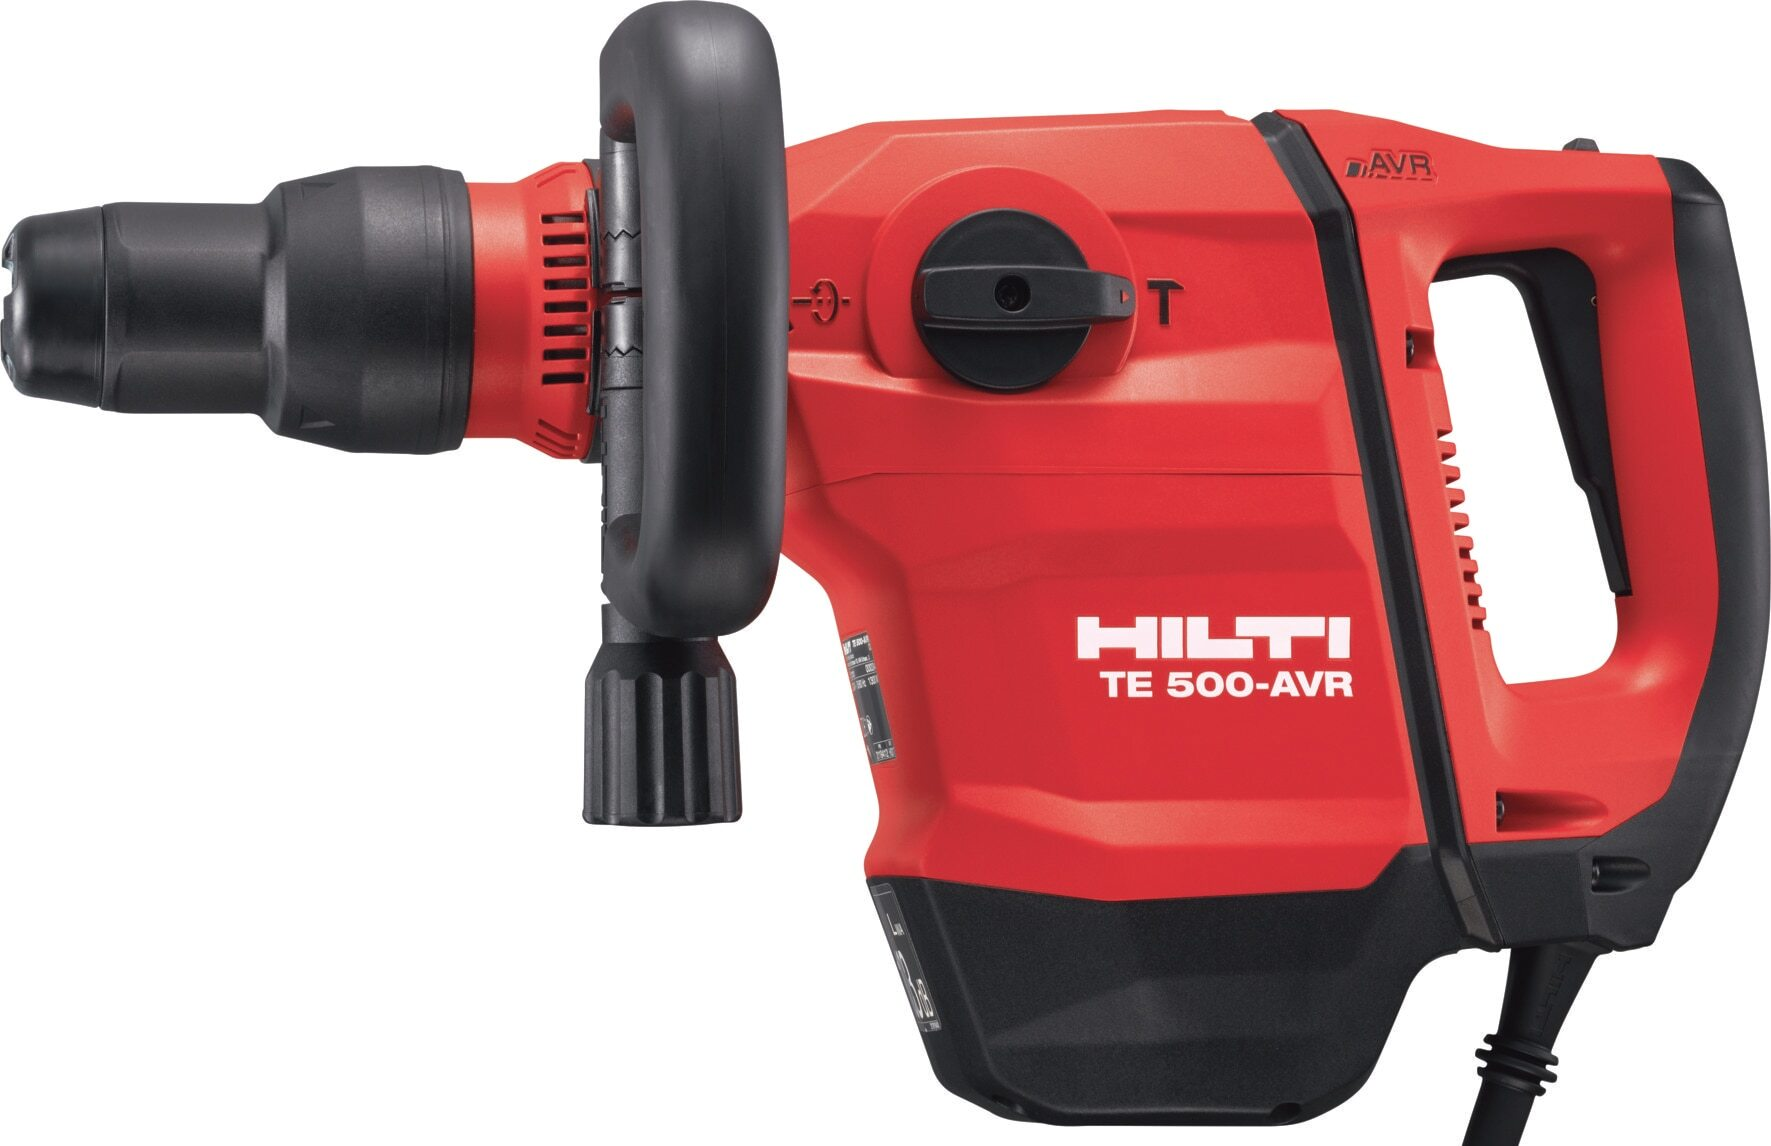 Hilti TE 500-AVR Wall Breaker